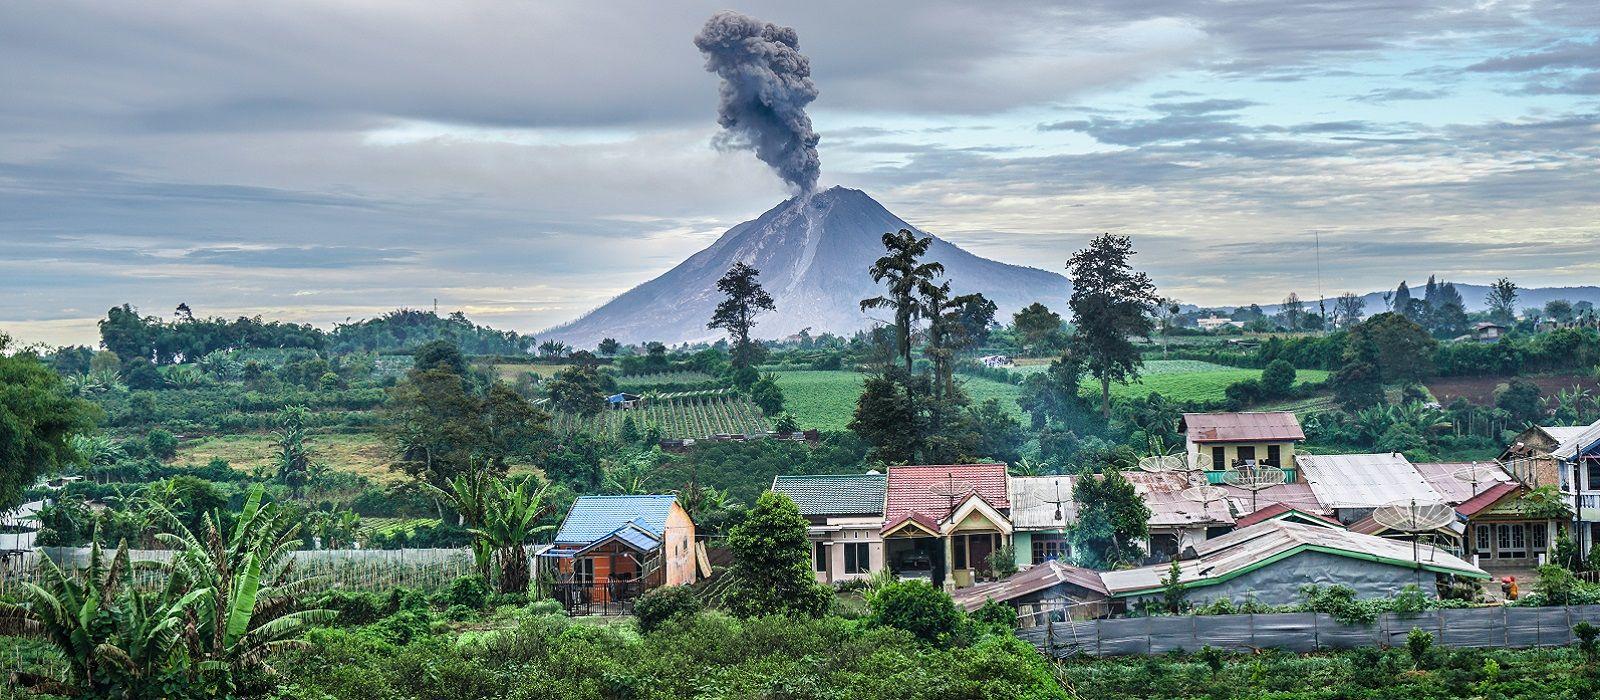 Reiseziel Berastagi Indonesien